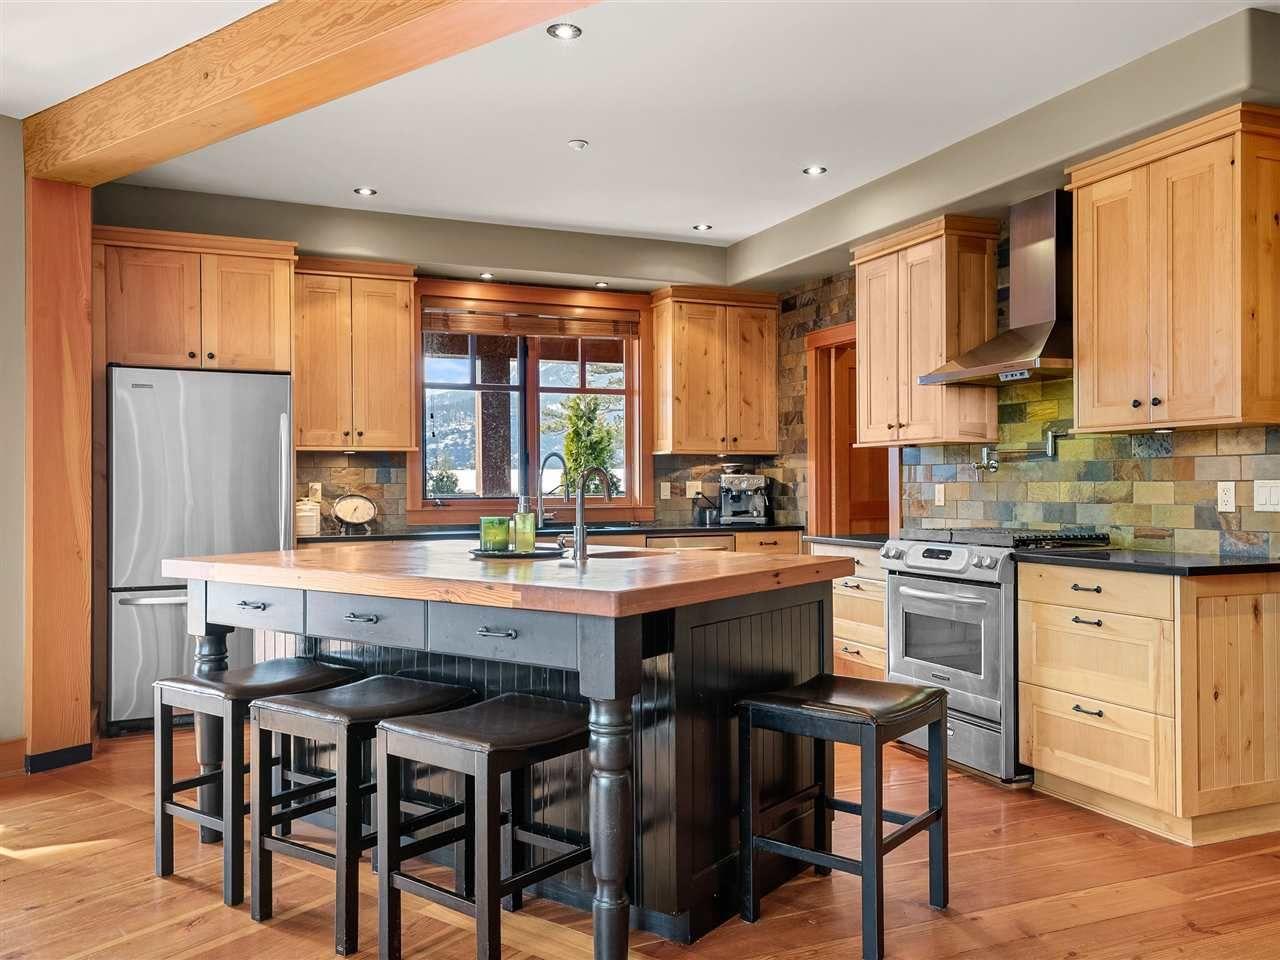 Photo 13: Photos: 1766 PINEWOOD DRIVE: Pemberton House for sale : MLS®# R2543608